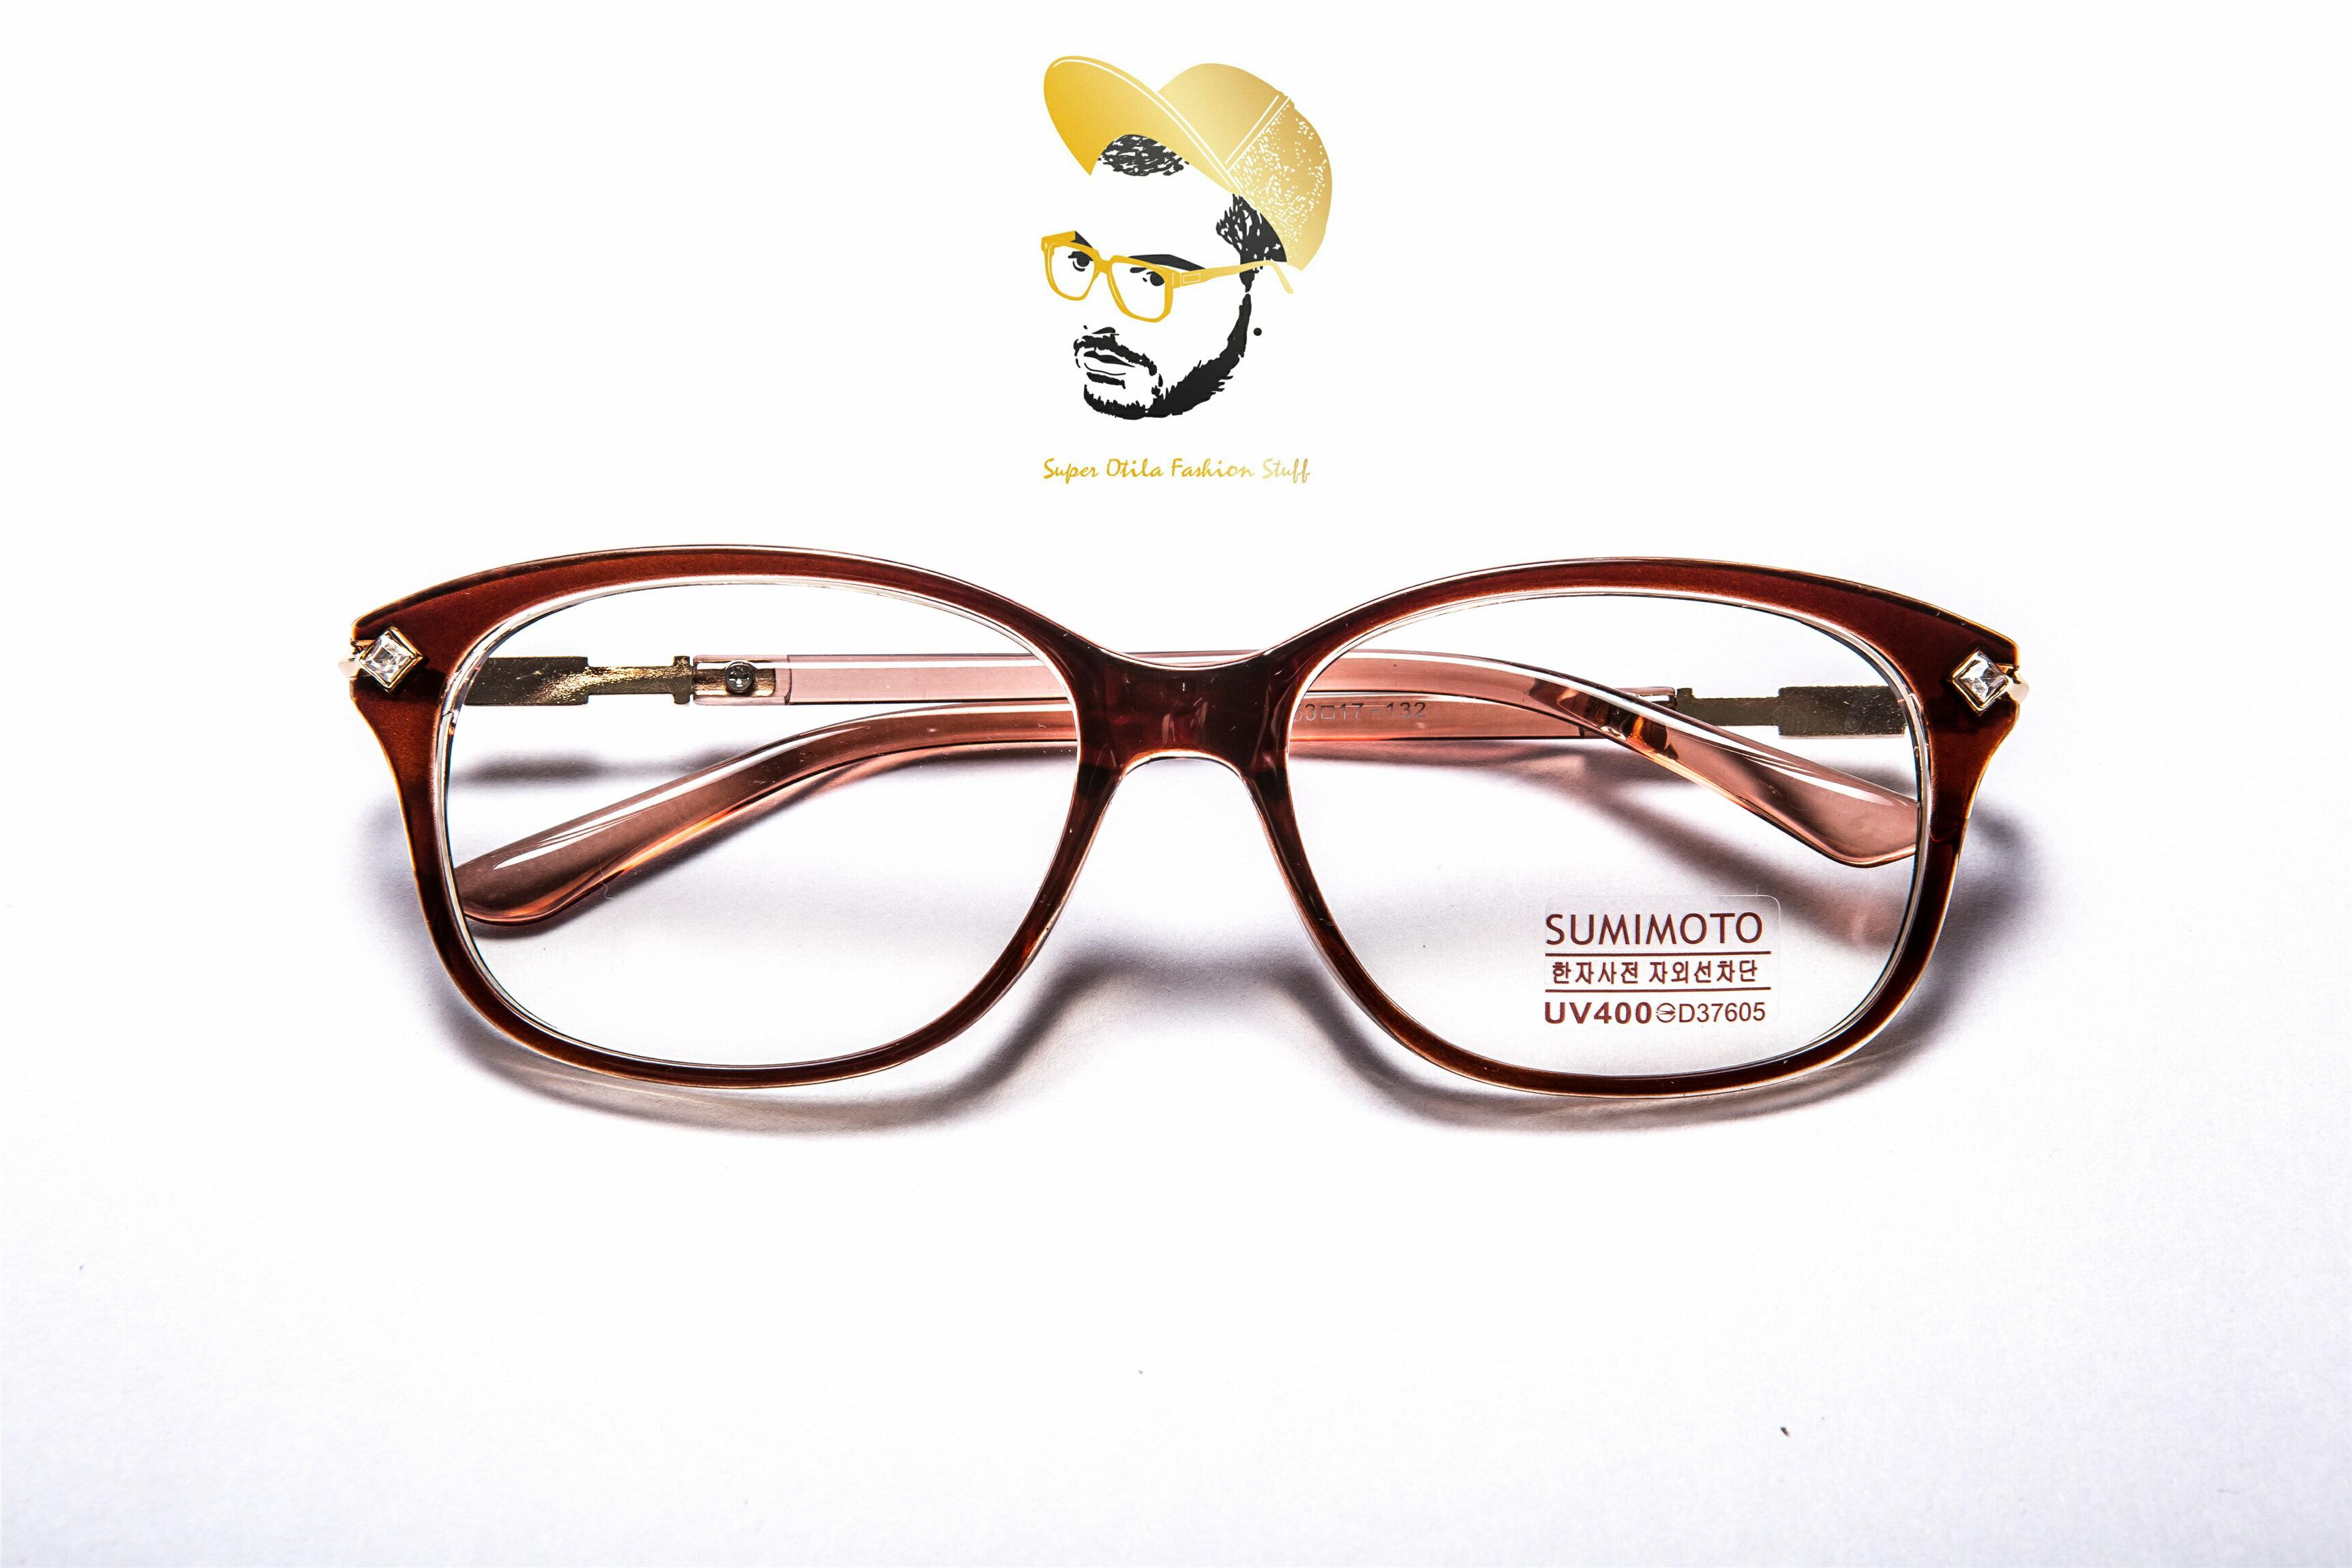 glasses for lovers 太陽眼鏡 墨鏡 眼鏡 韓國 ~9363~小方鑽~咖啡